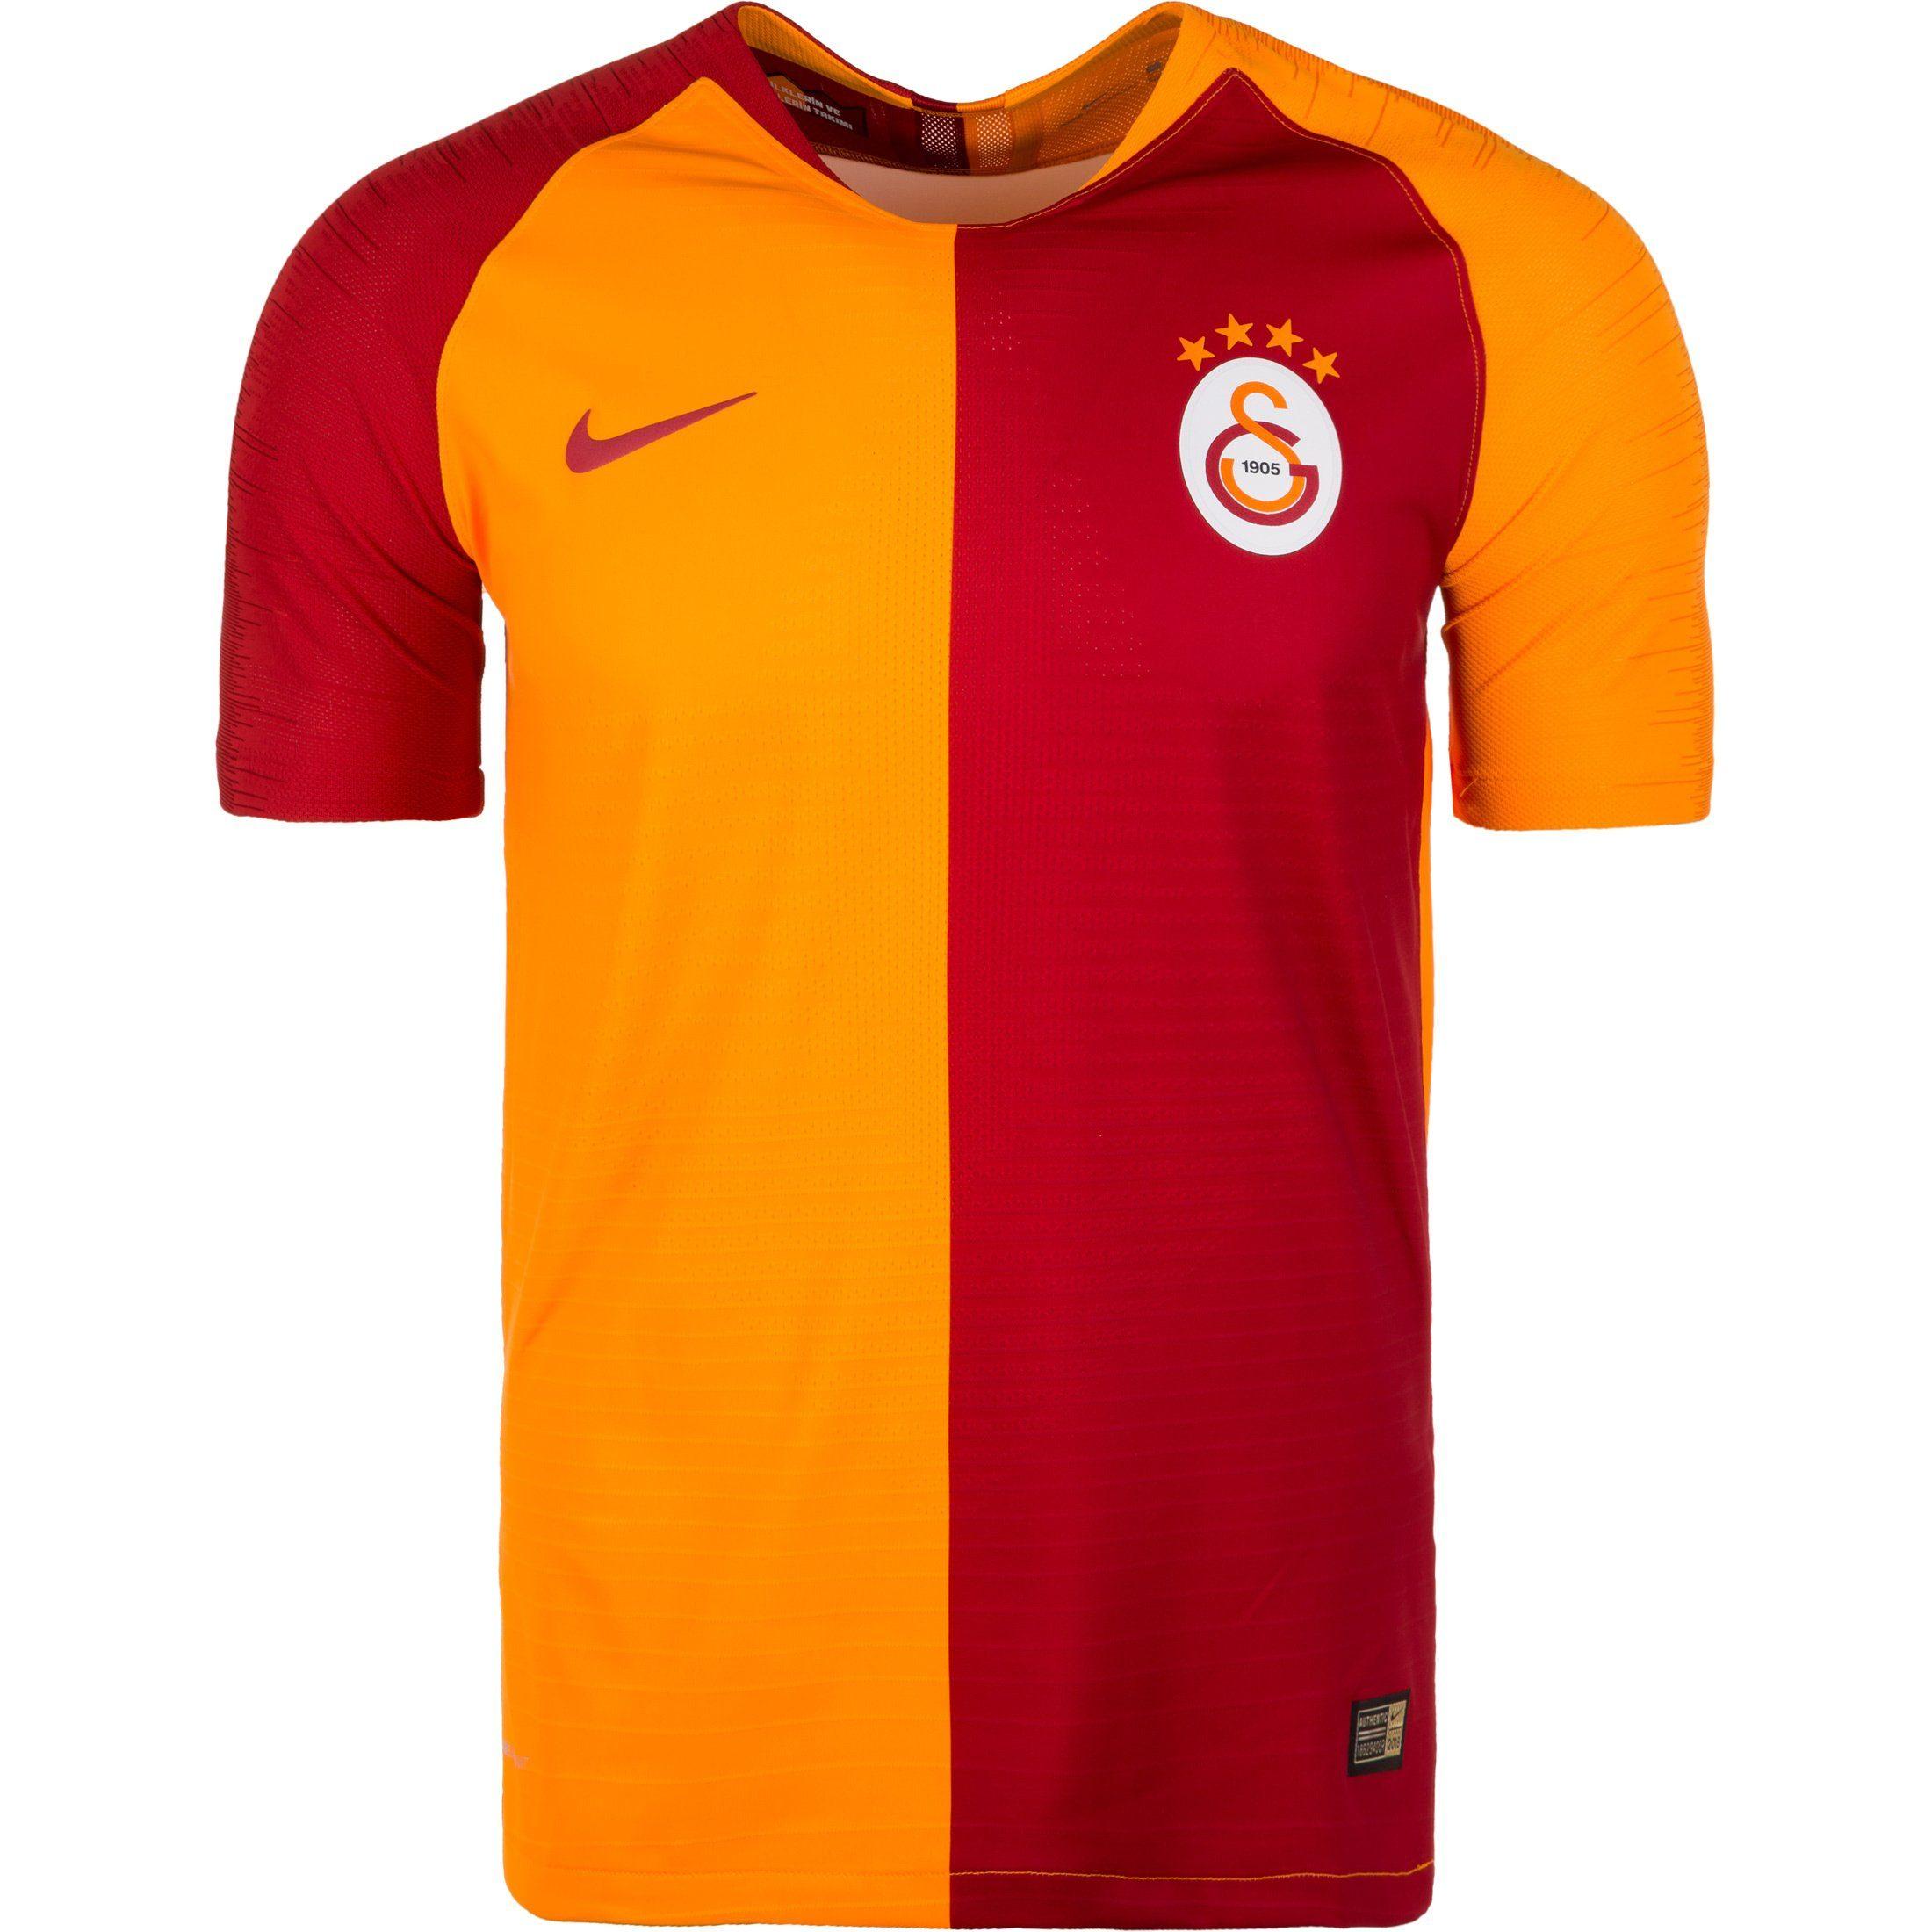 Nike Fußballtrikot Galatasaray Istanbul Vapor Match 18/19 Heim | Sportbekleidung > Trikots > Fußballtrikots | Orange | Trikot | Nike